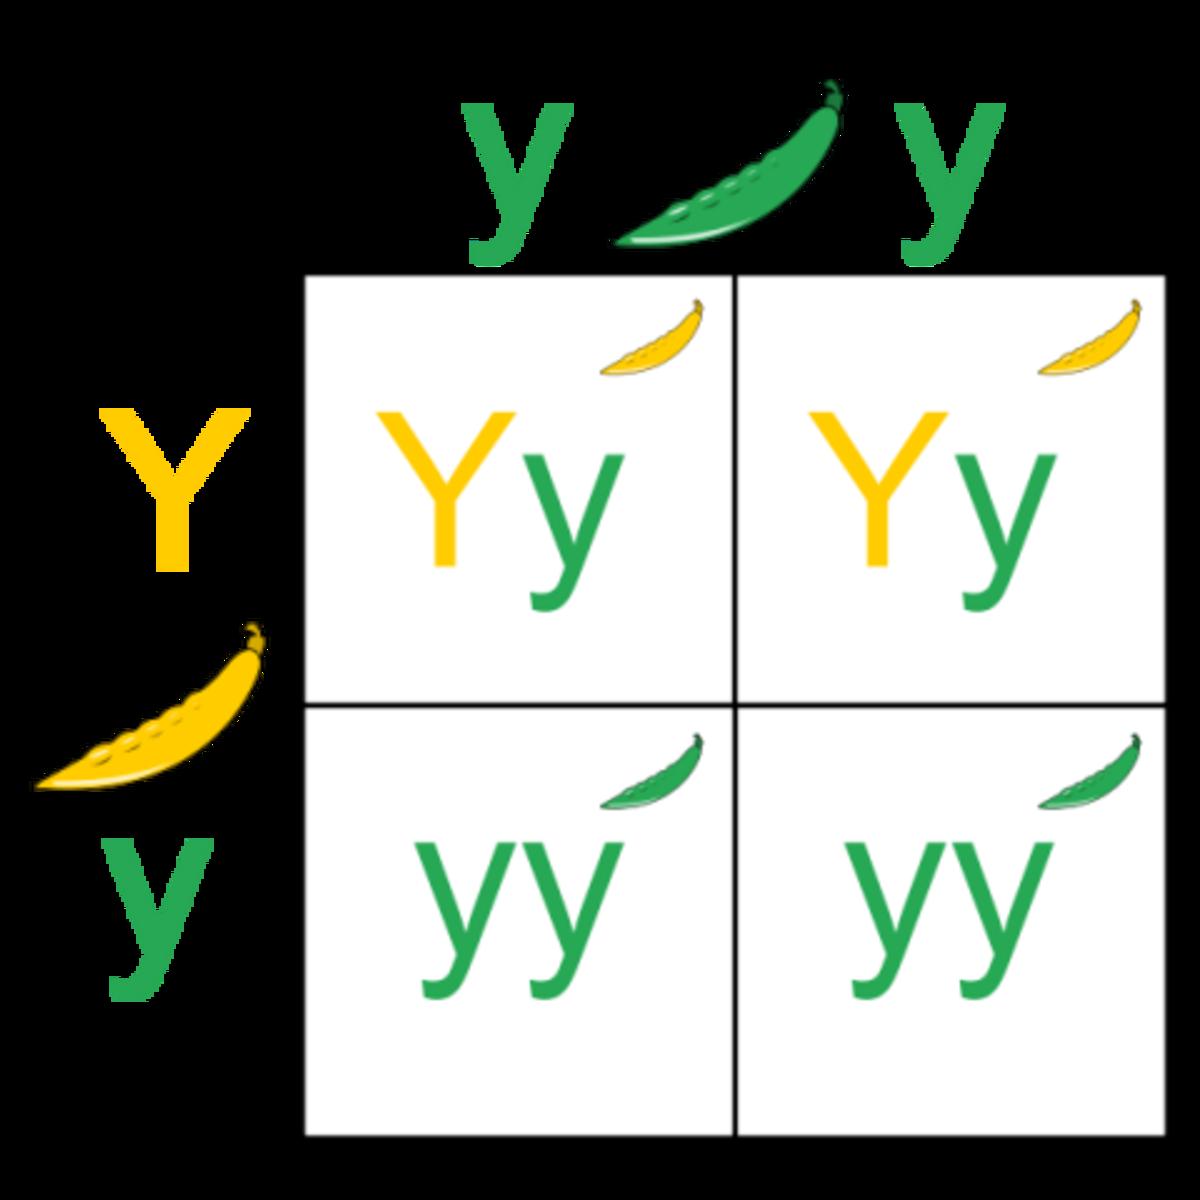 http://amcannon.files.wordpress.com/2009/02/600px-punnett_square_svg.png?w=480&h=480